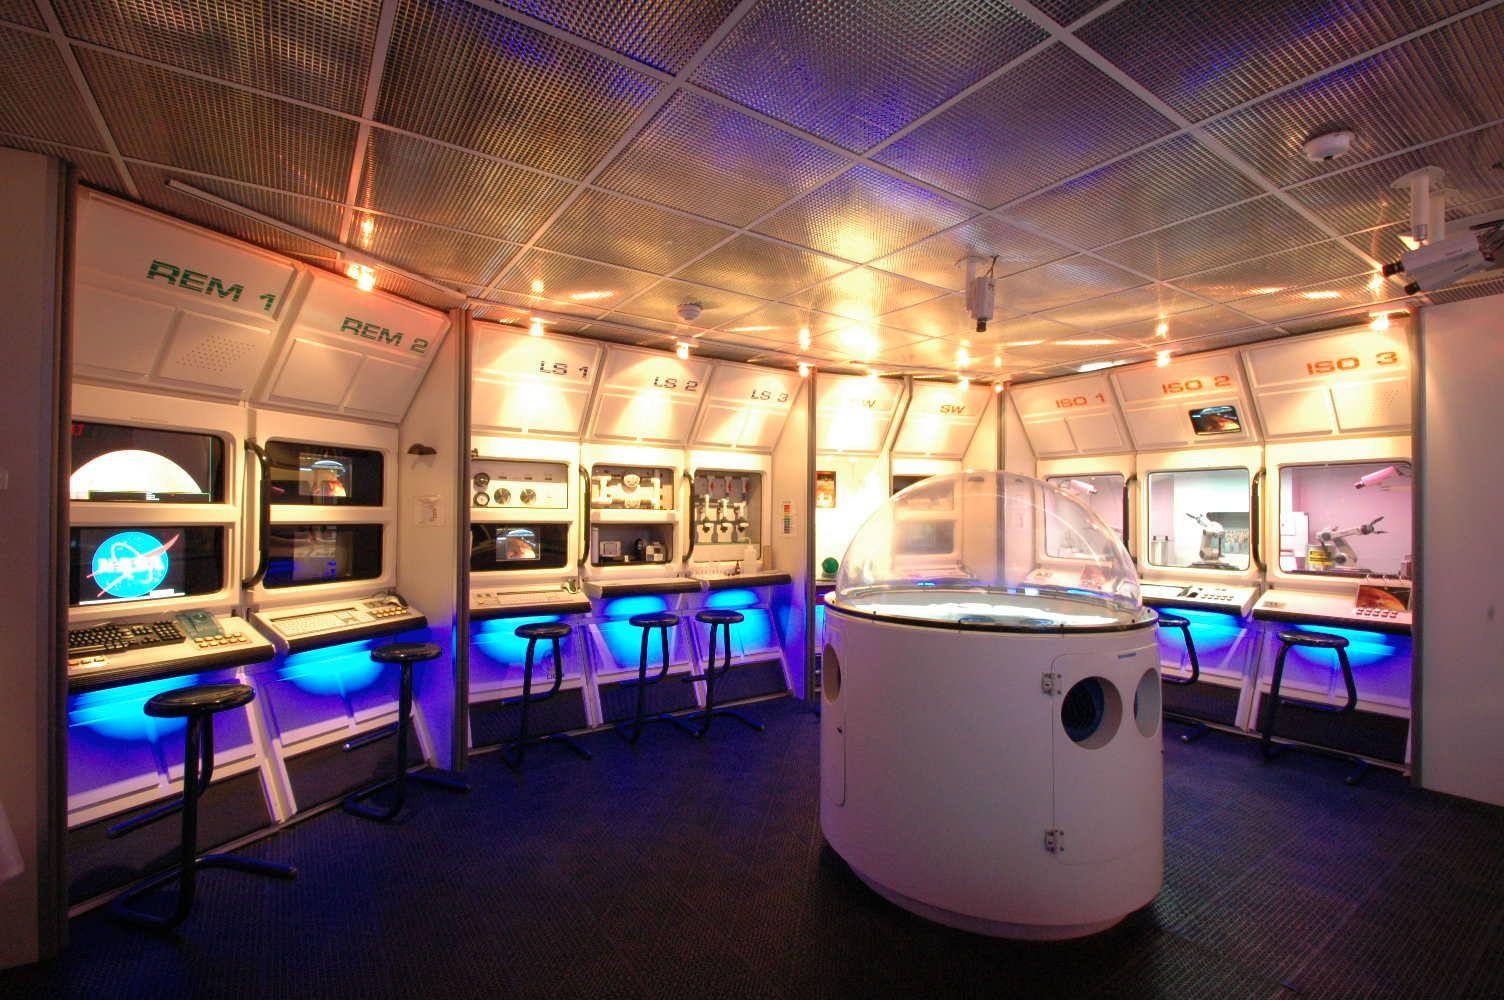 LOCATION Christa McAuliffe Space Education Center